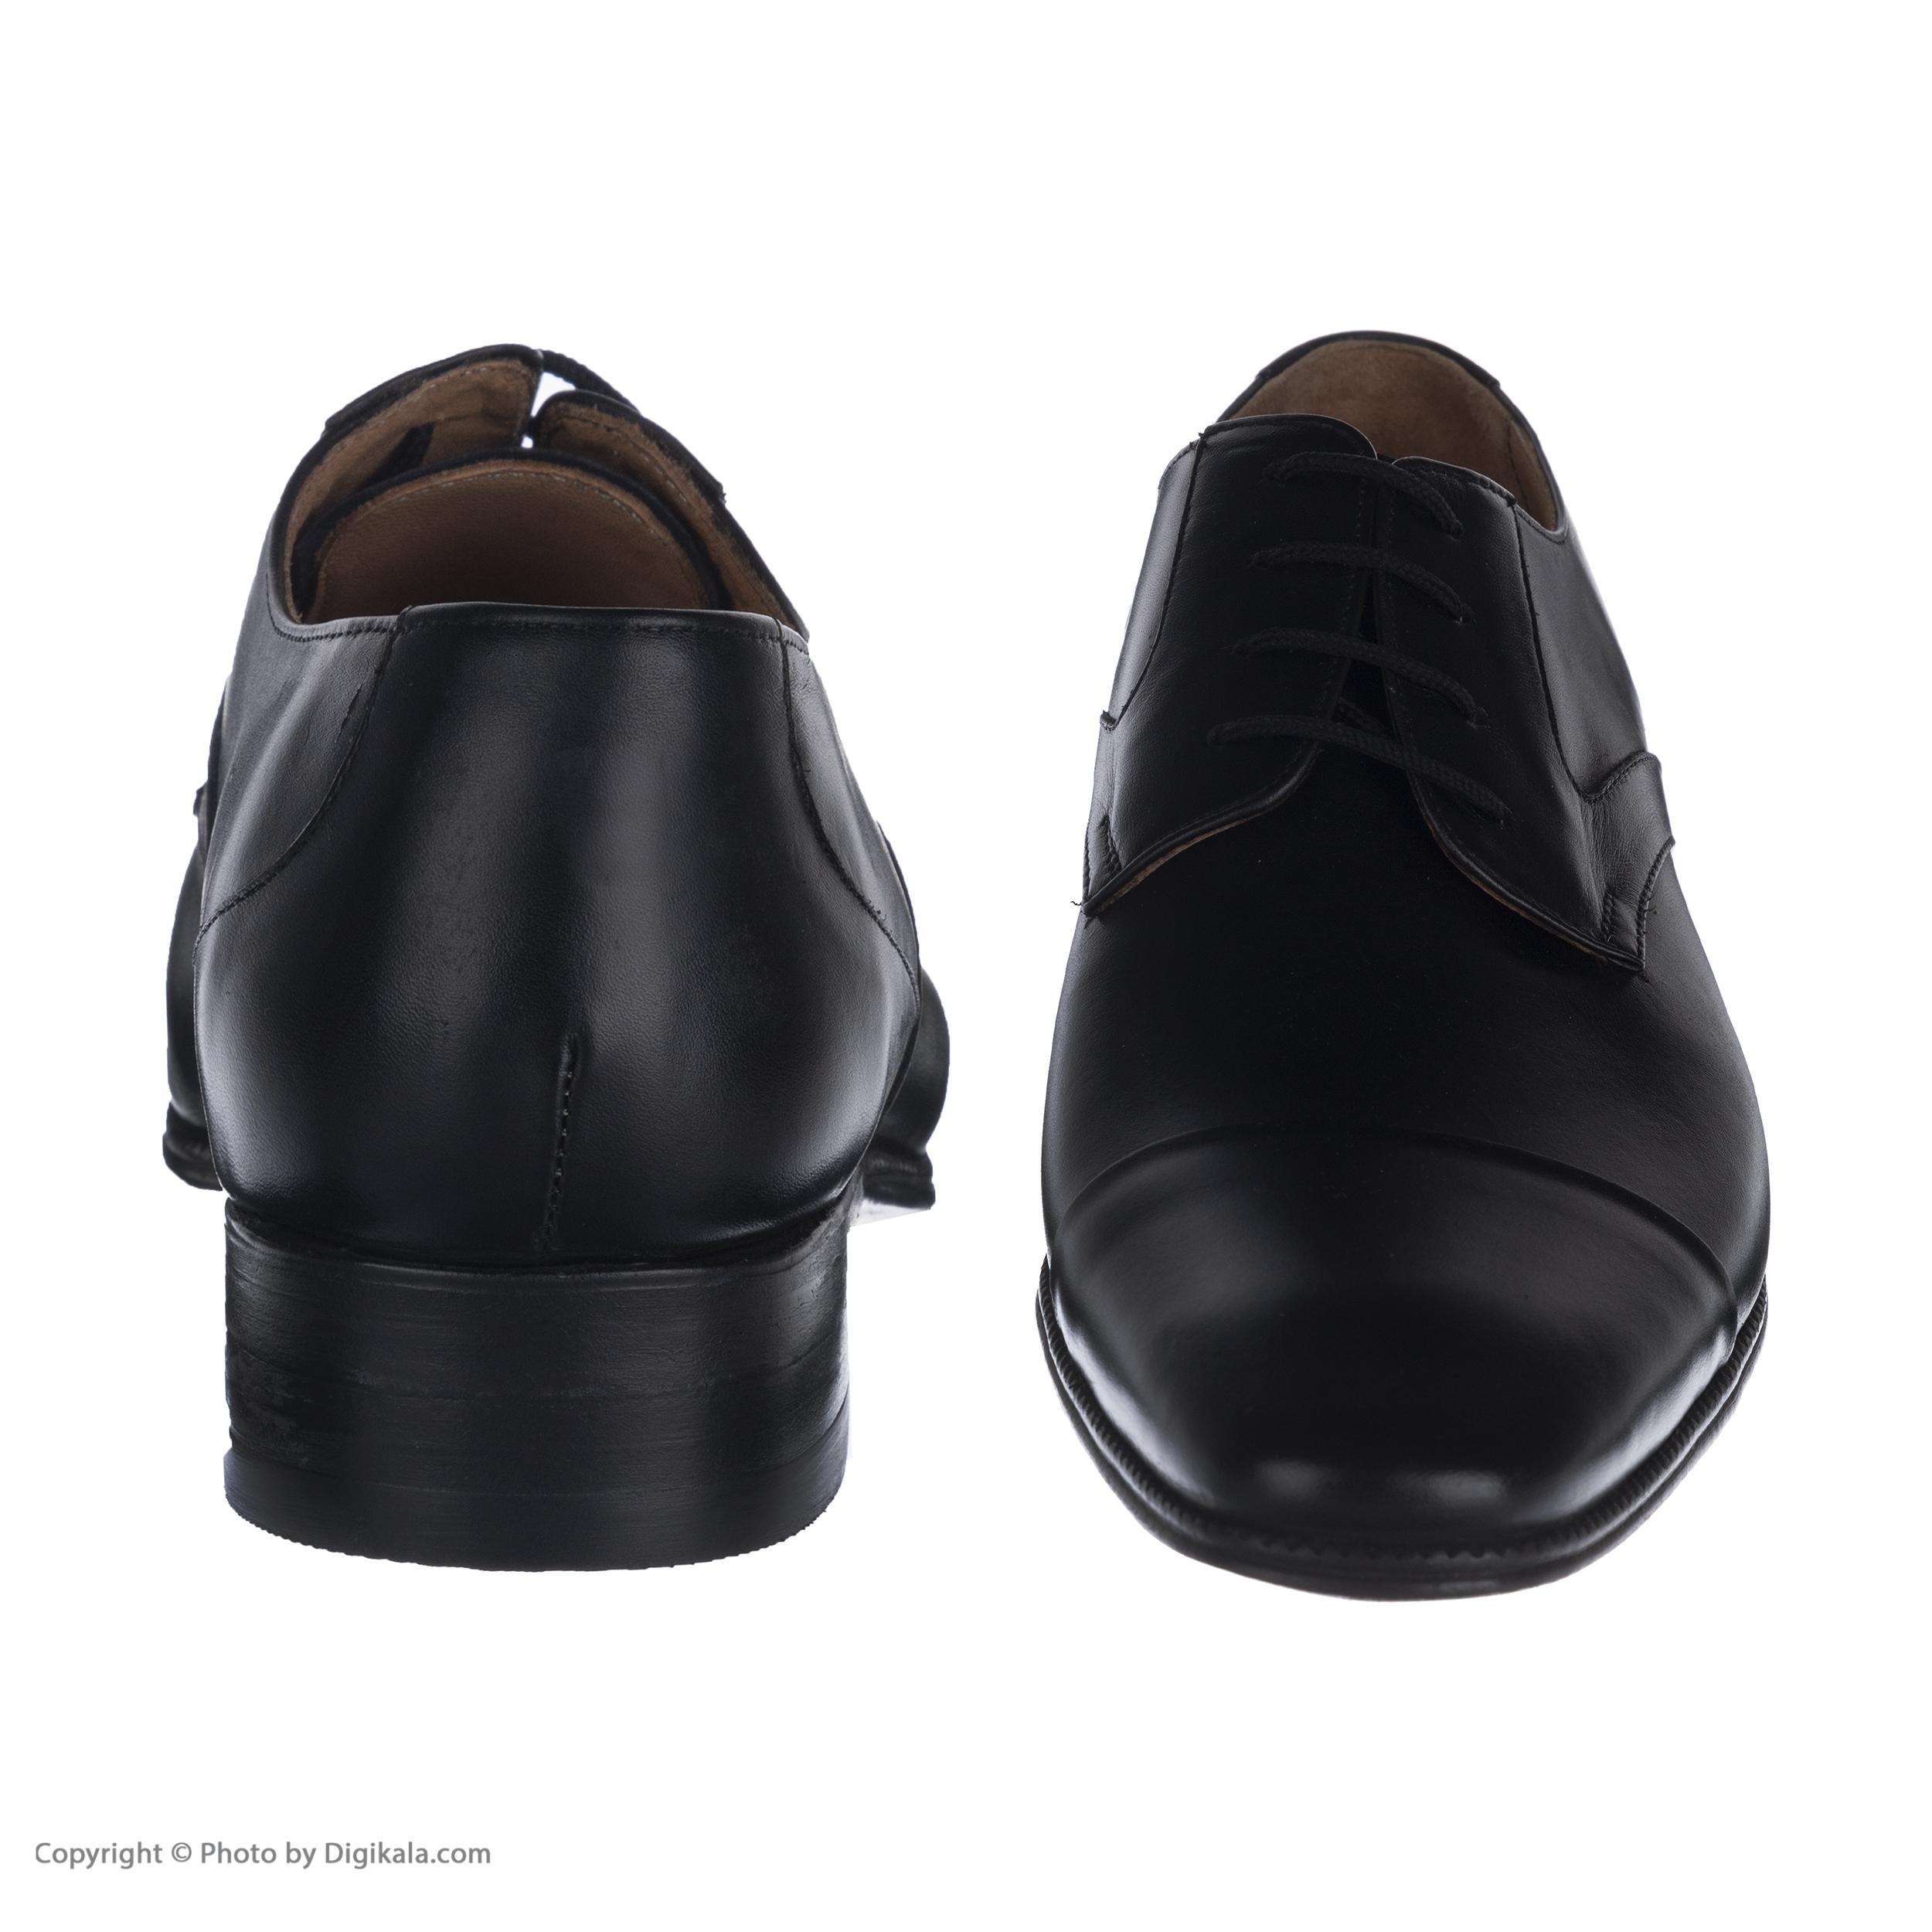 کفش مردانه نظری کد 413 -  - 2